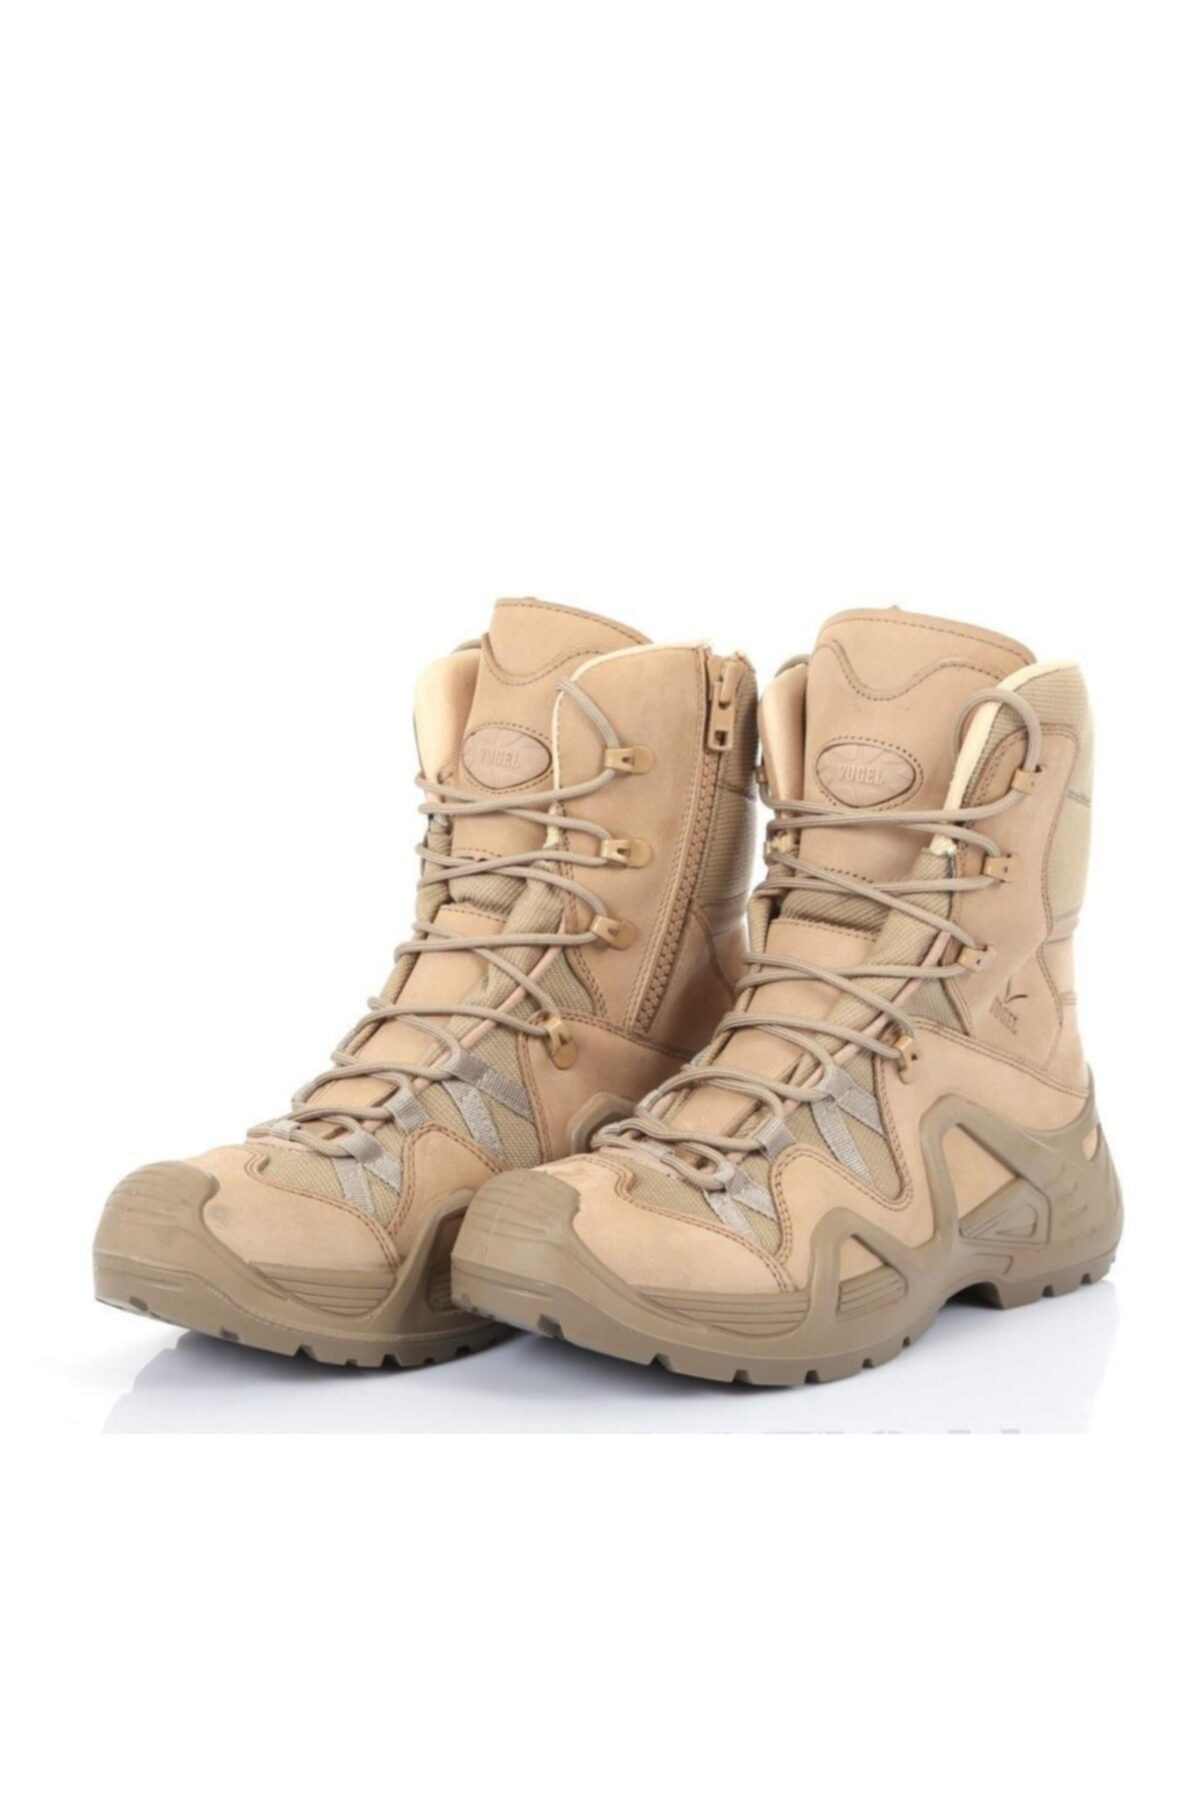 کفش کوهنوردی مردانه شیک مجلسی برند Vogel رنگ قهوه ای کد ty44270249